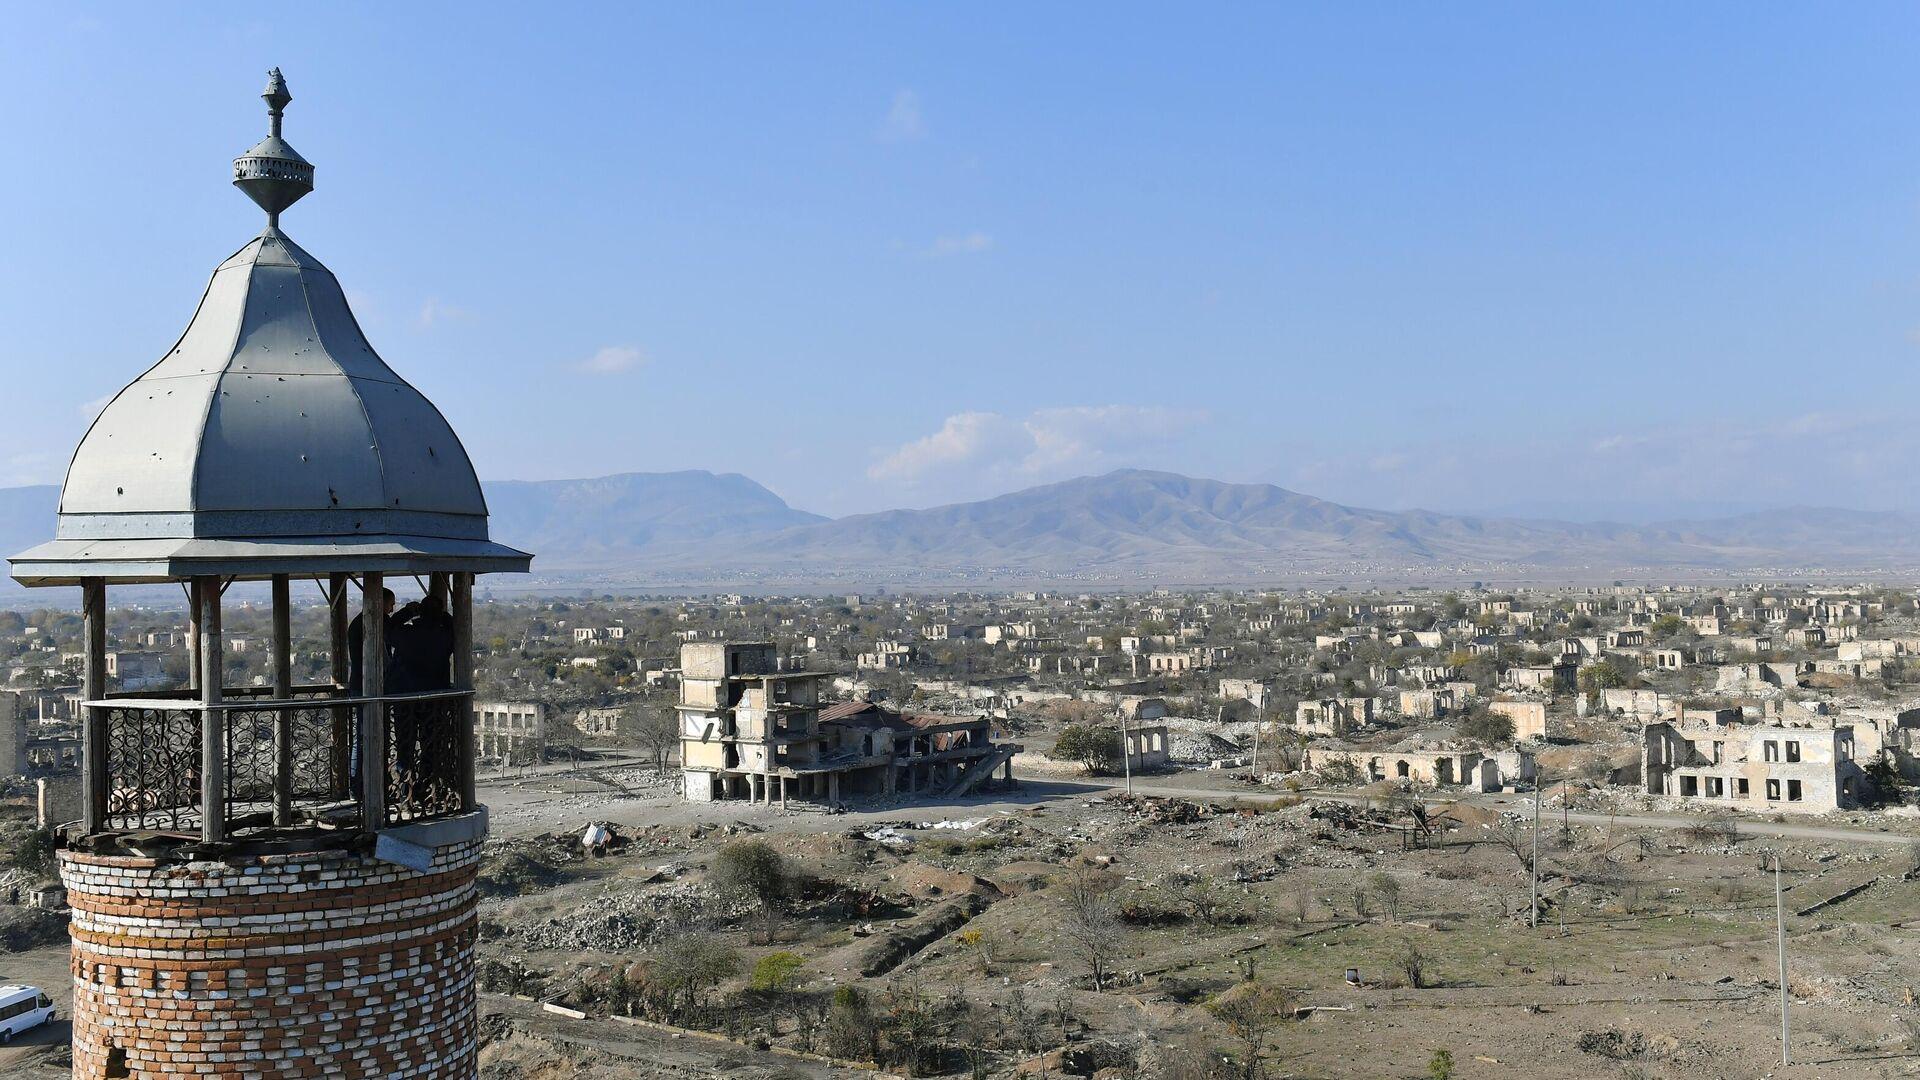 Вид на город Агдам с мечети Джума - РИА Новости, 1920, 17.05.2021